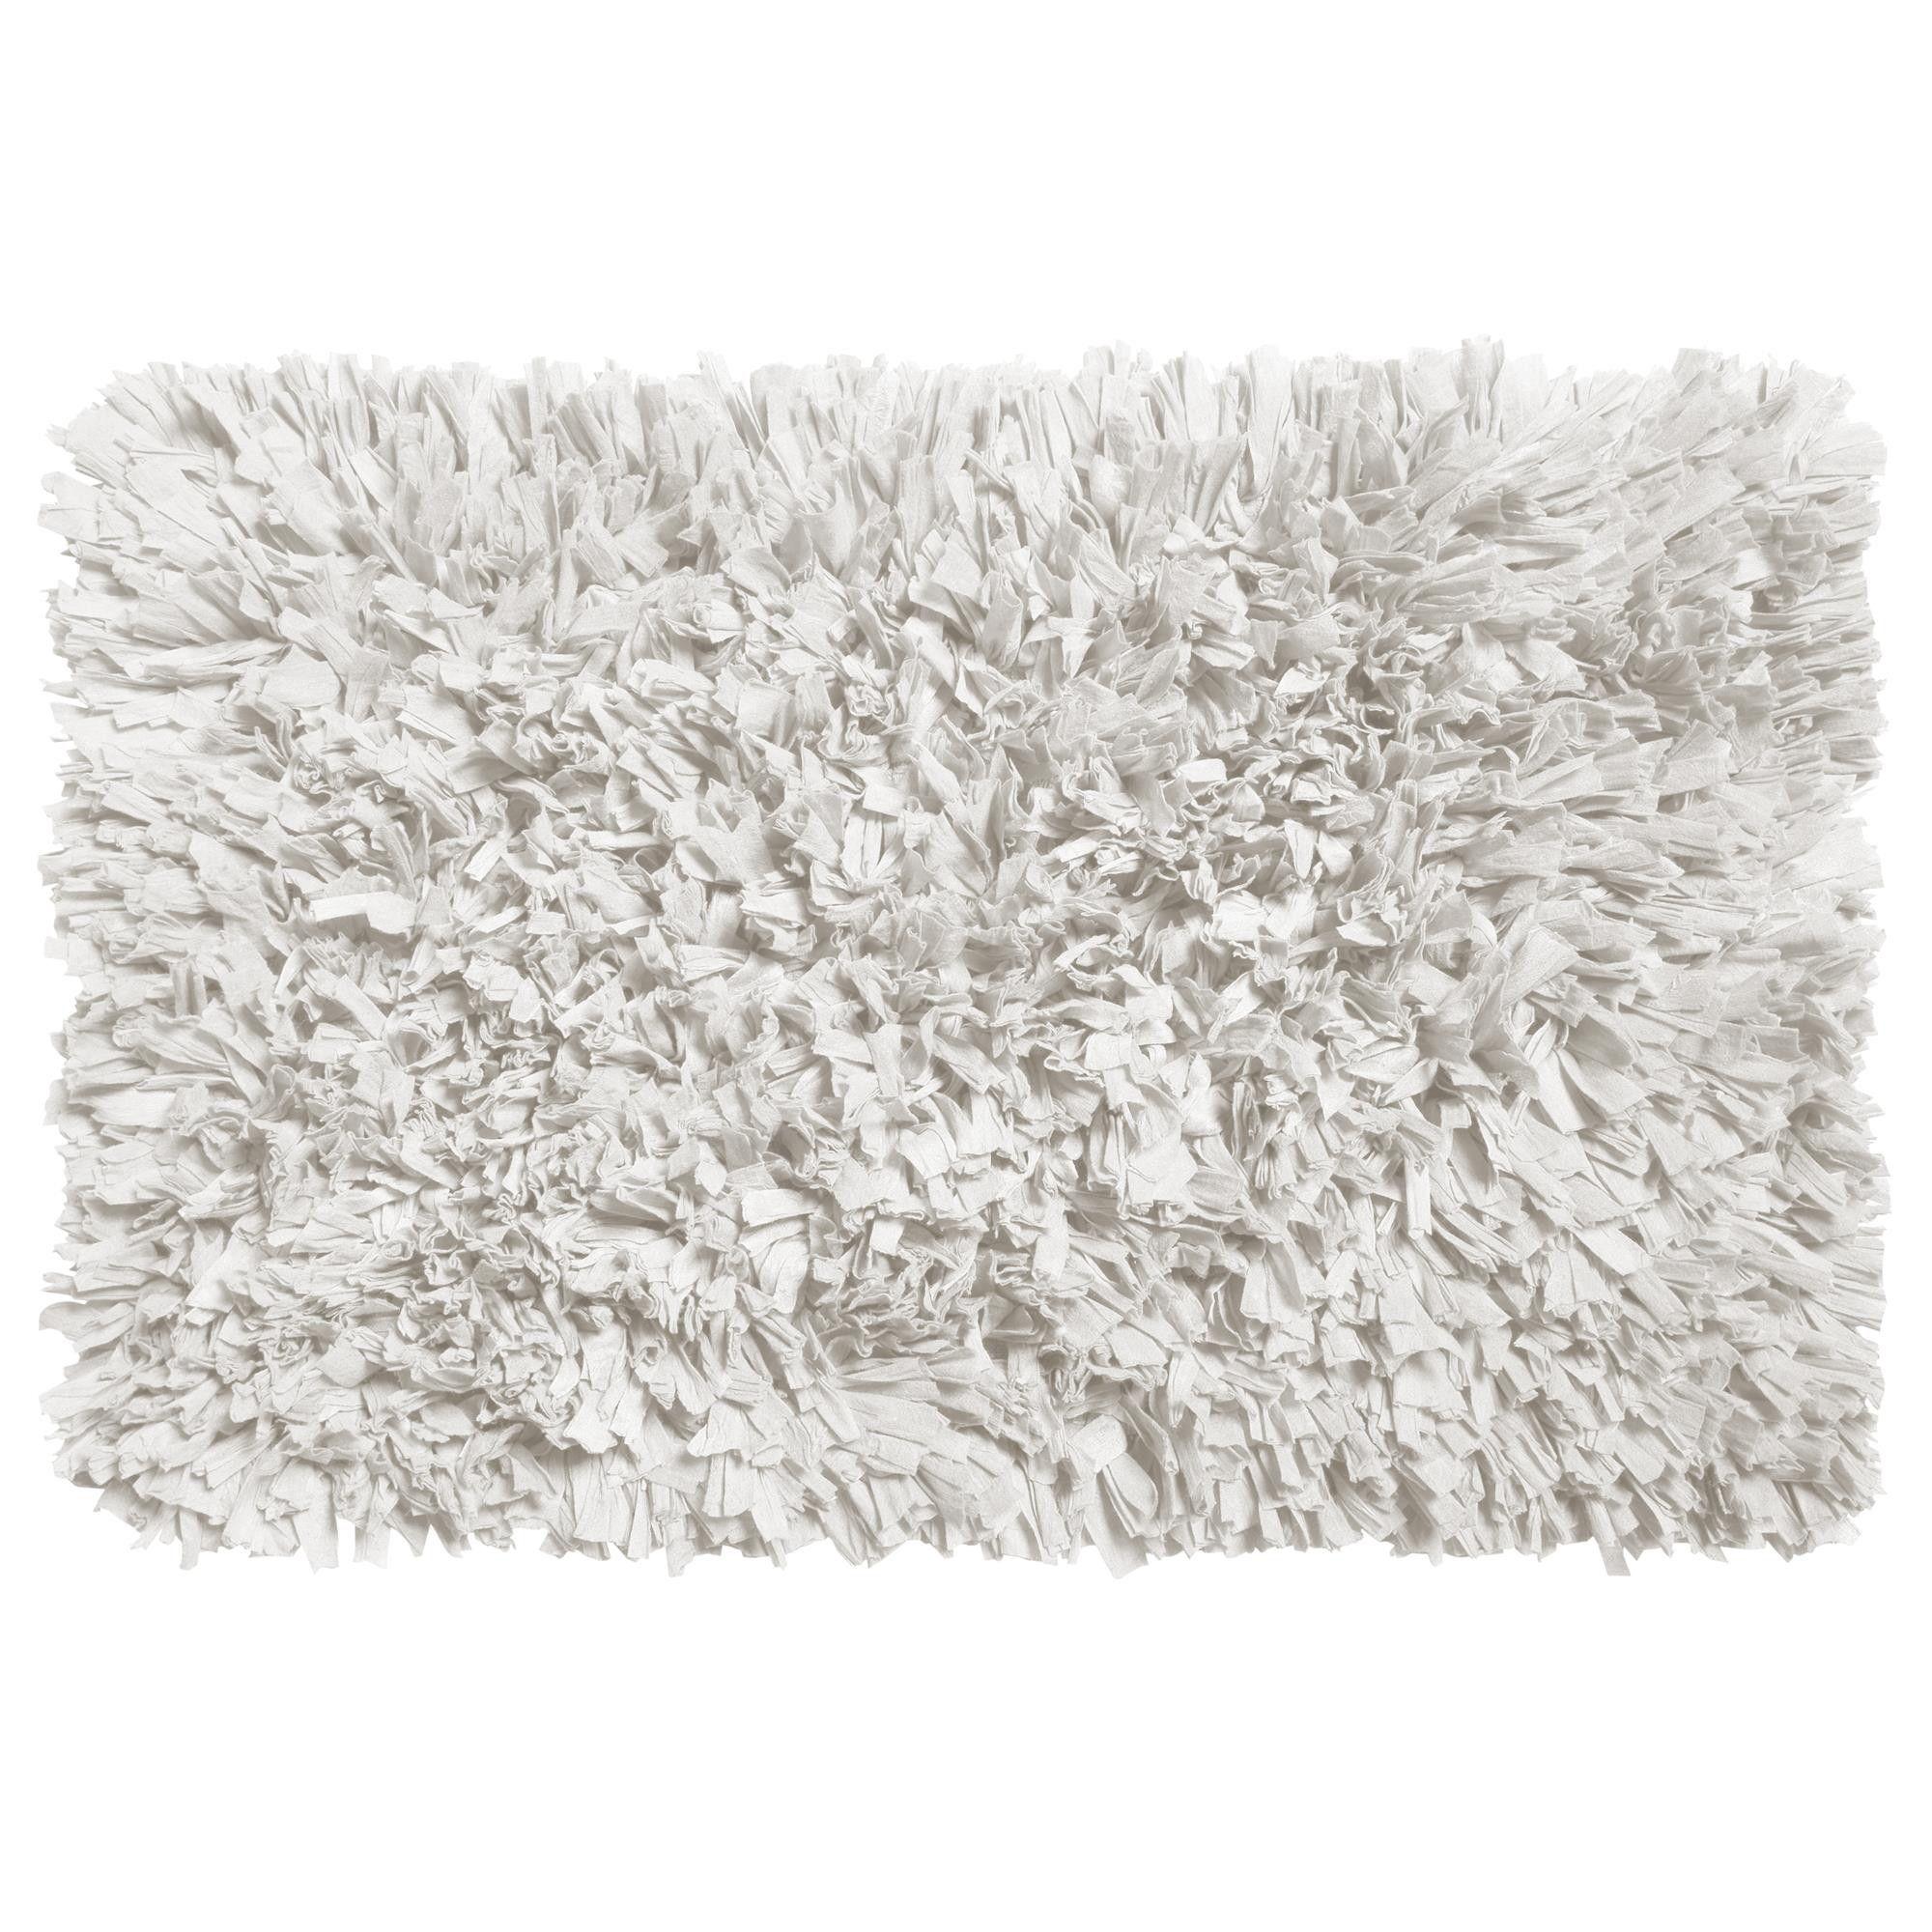 array clara foam clark mats rug products white memory bath cozy contour mat